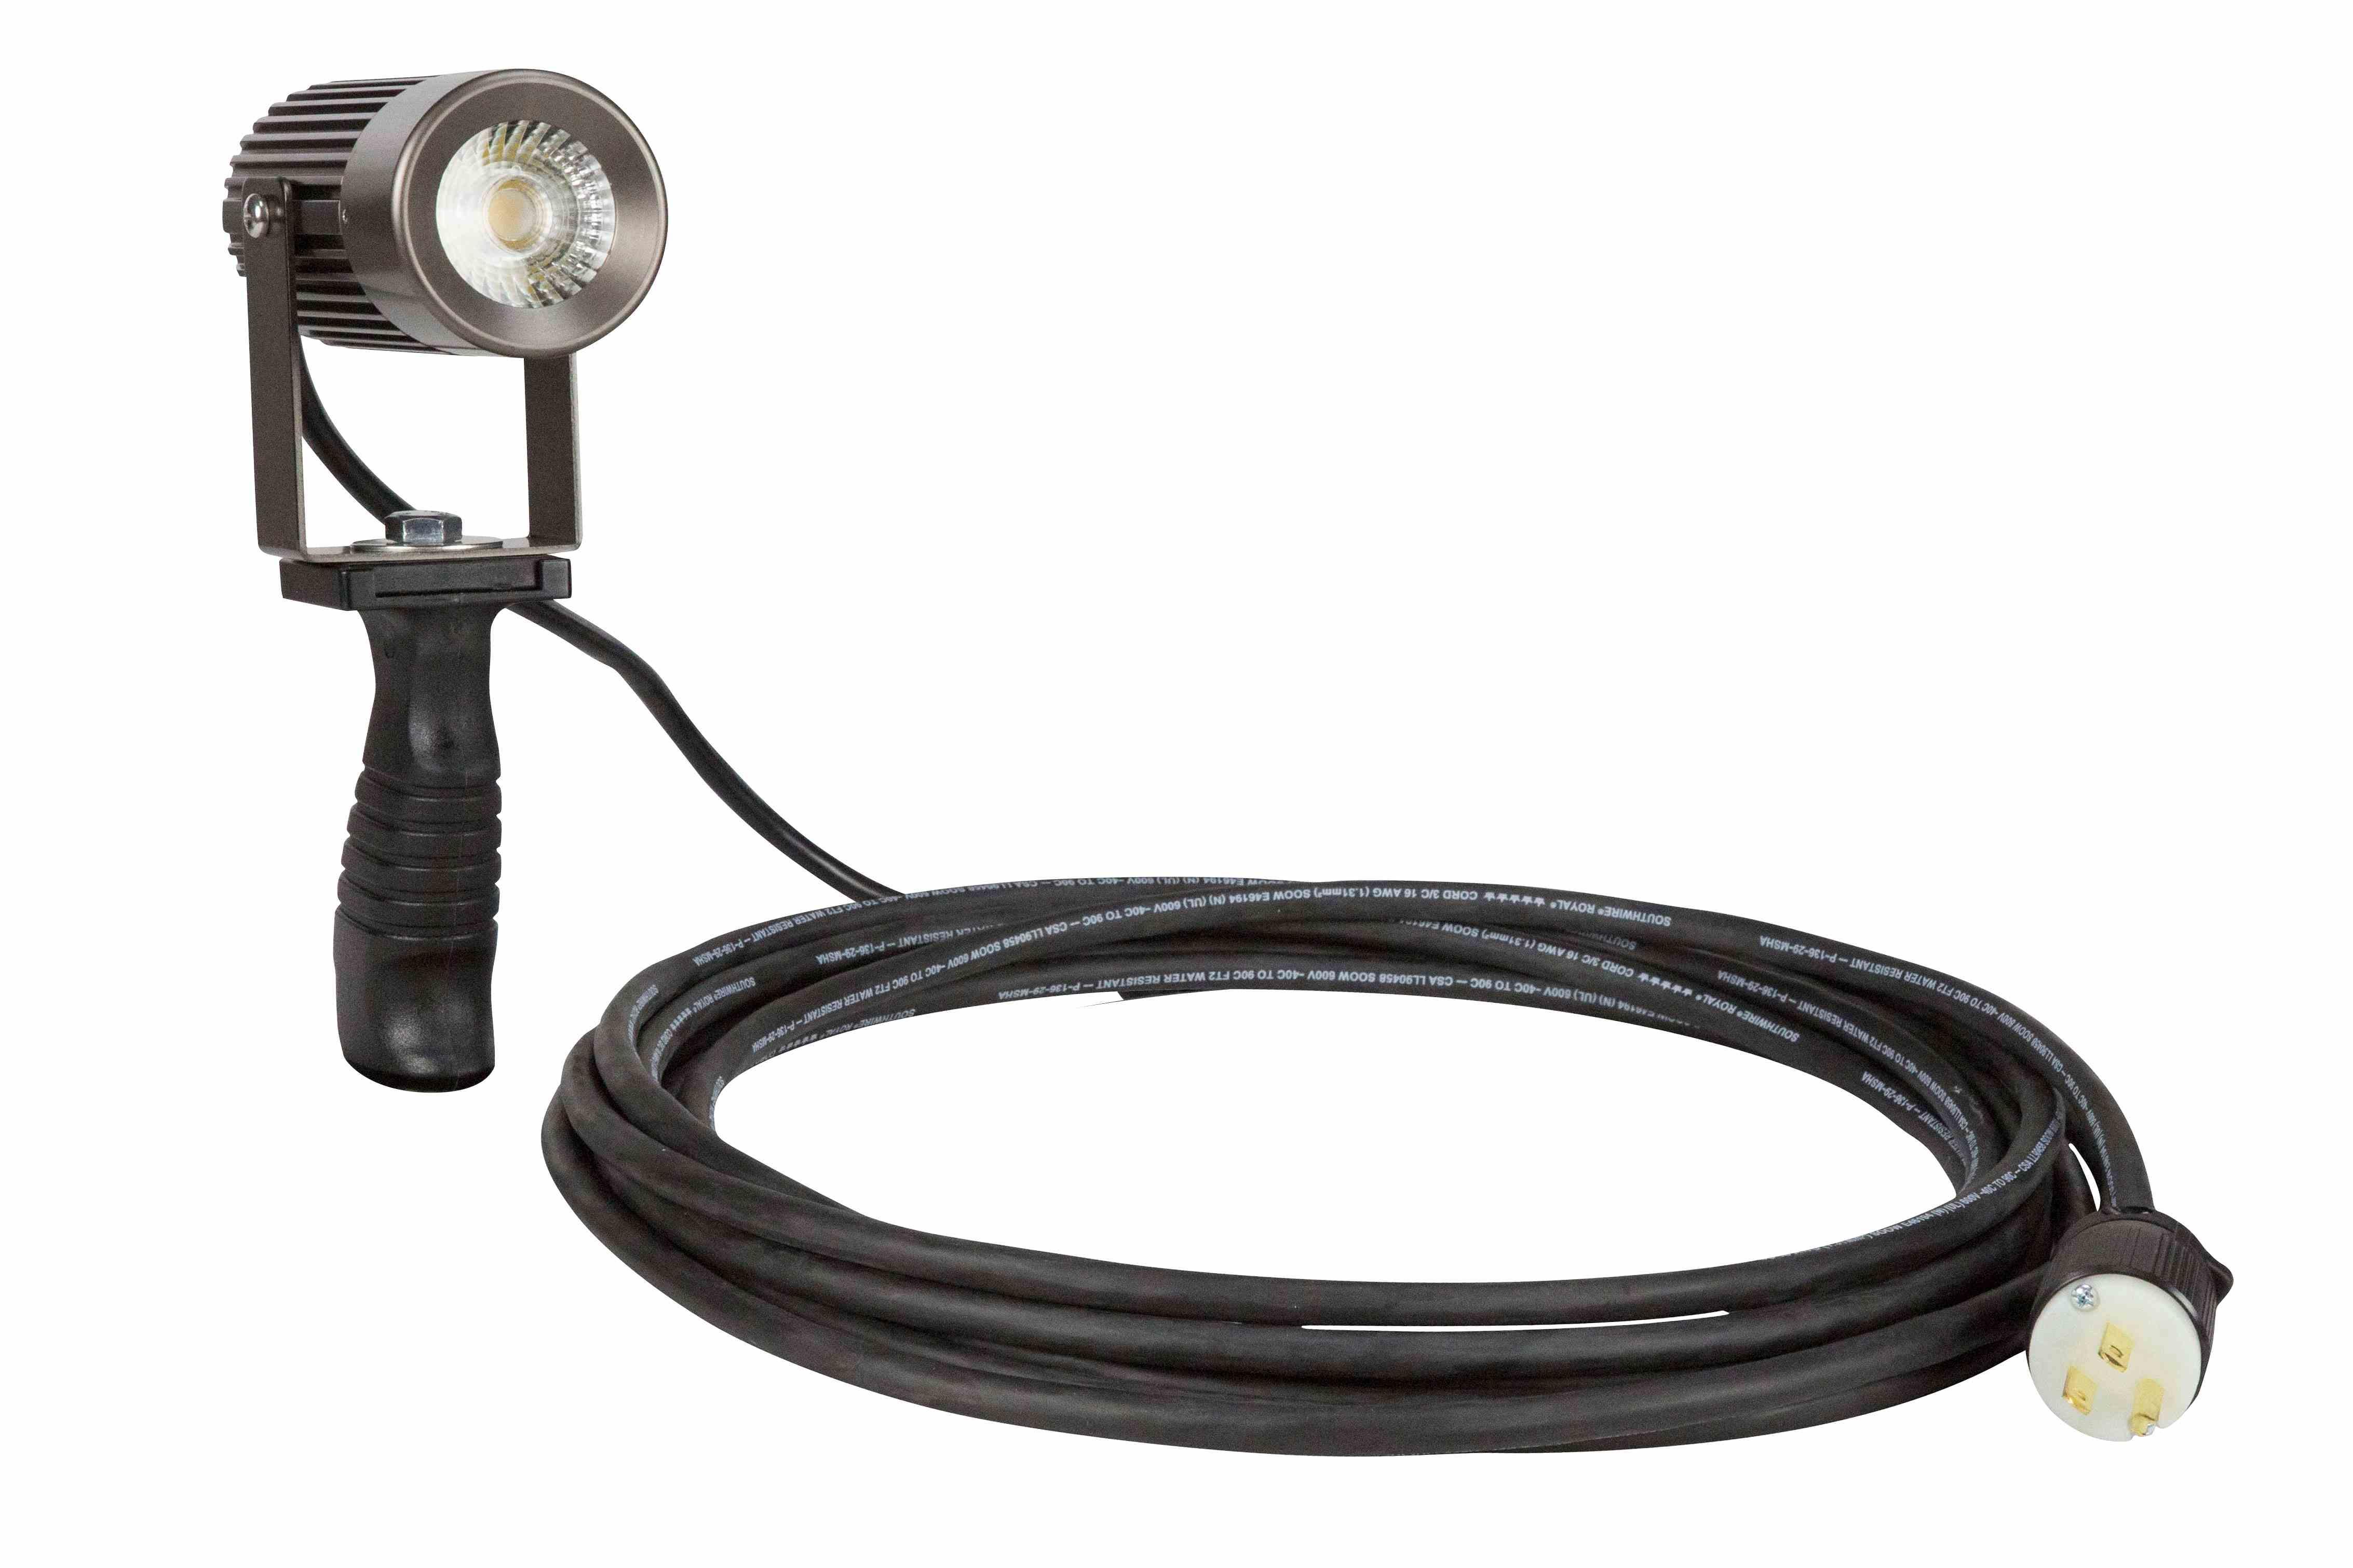 18 Watt Handheld LED Spotlight for Industrial Lighting -Articulating Head- Polycarbonate Handle IP65